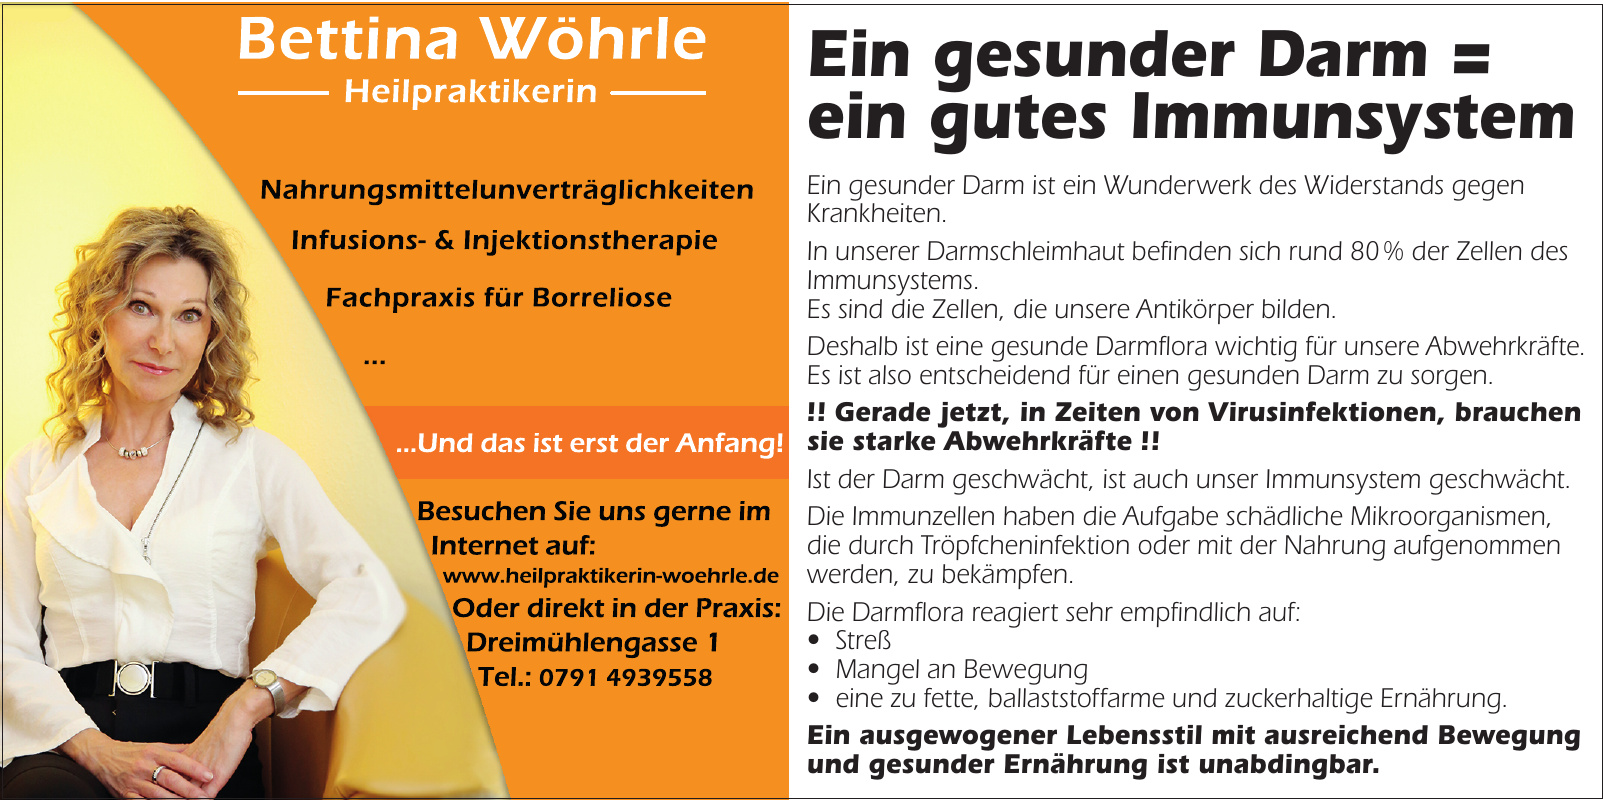 Bettina Wöhrle Heilpraktikerin